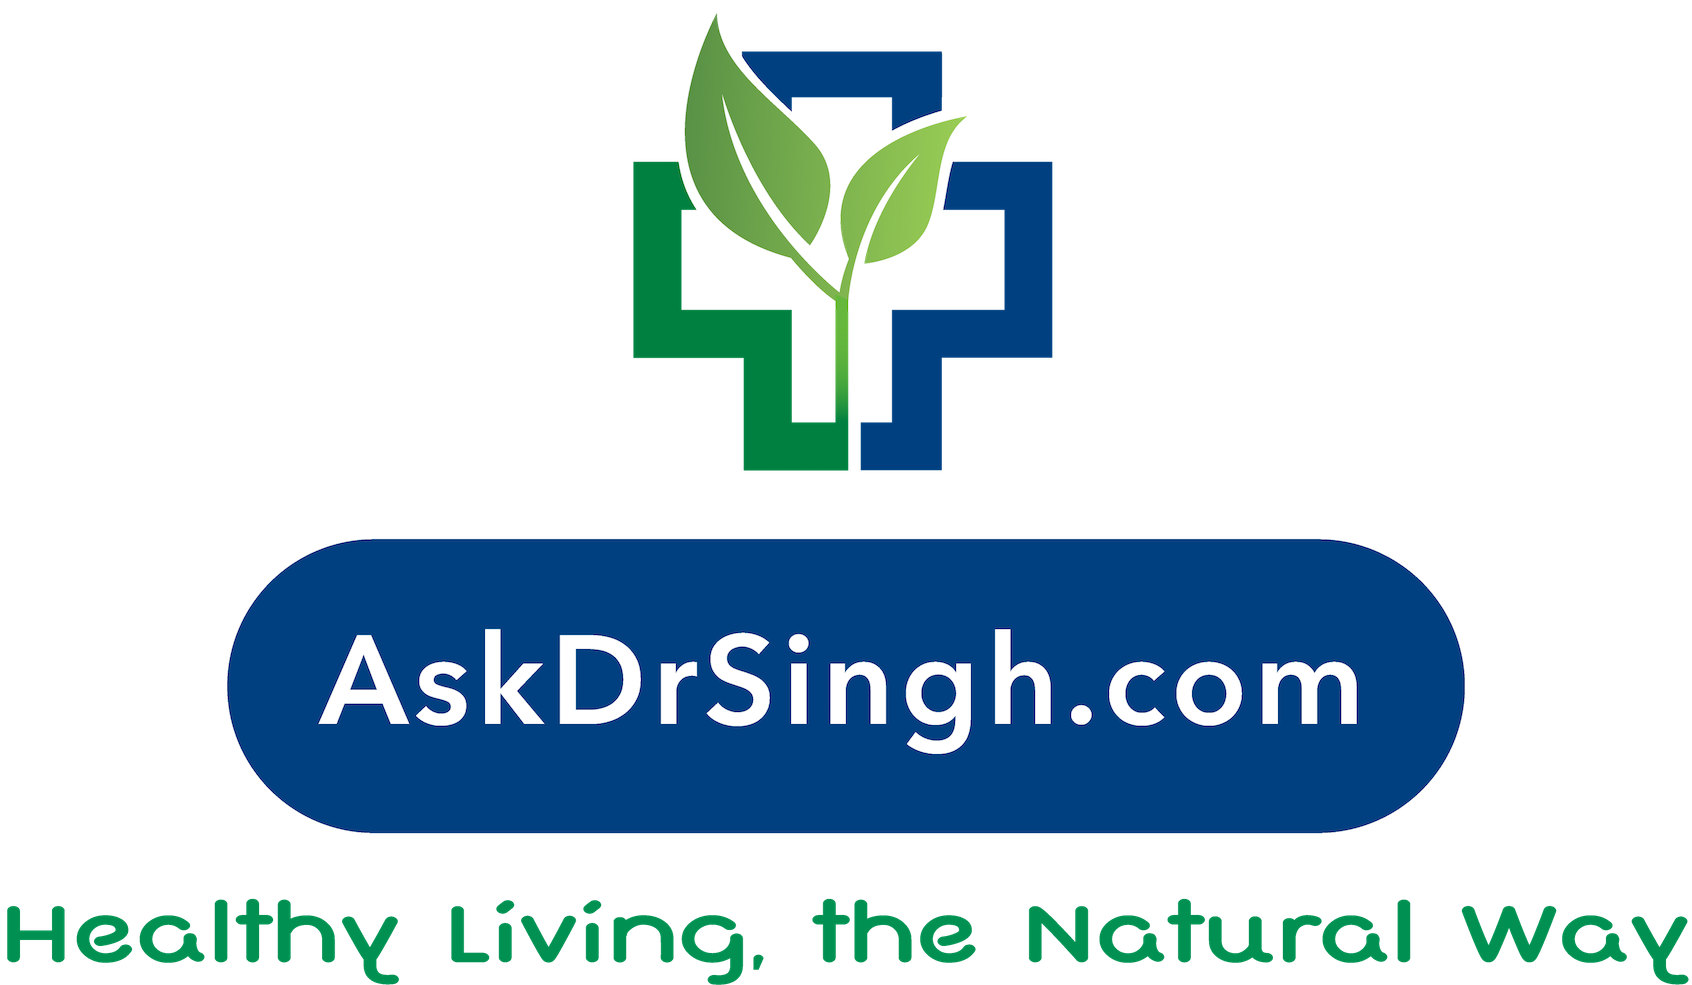 AskDrSingh.com Logo